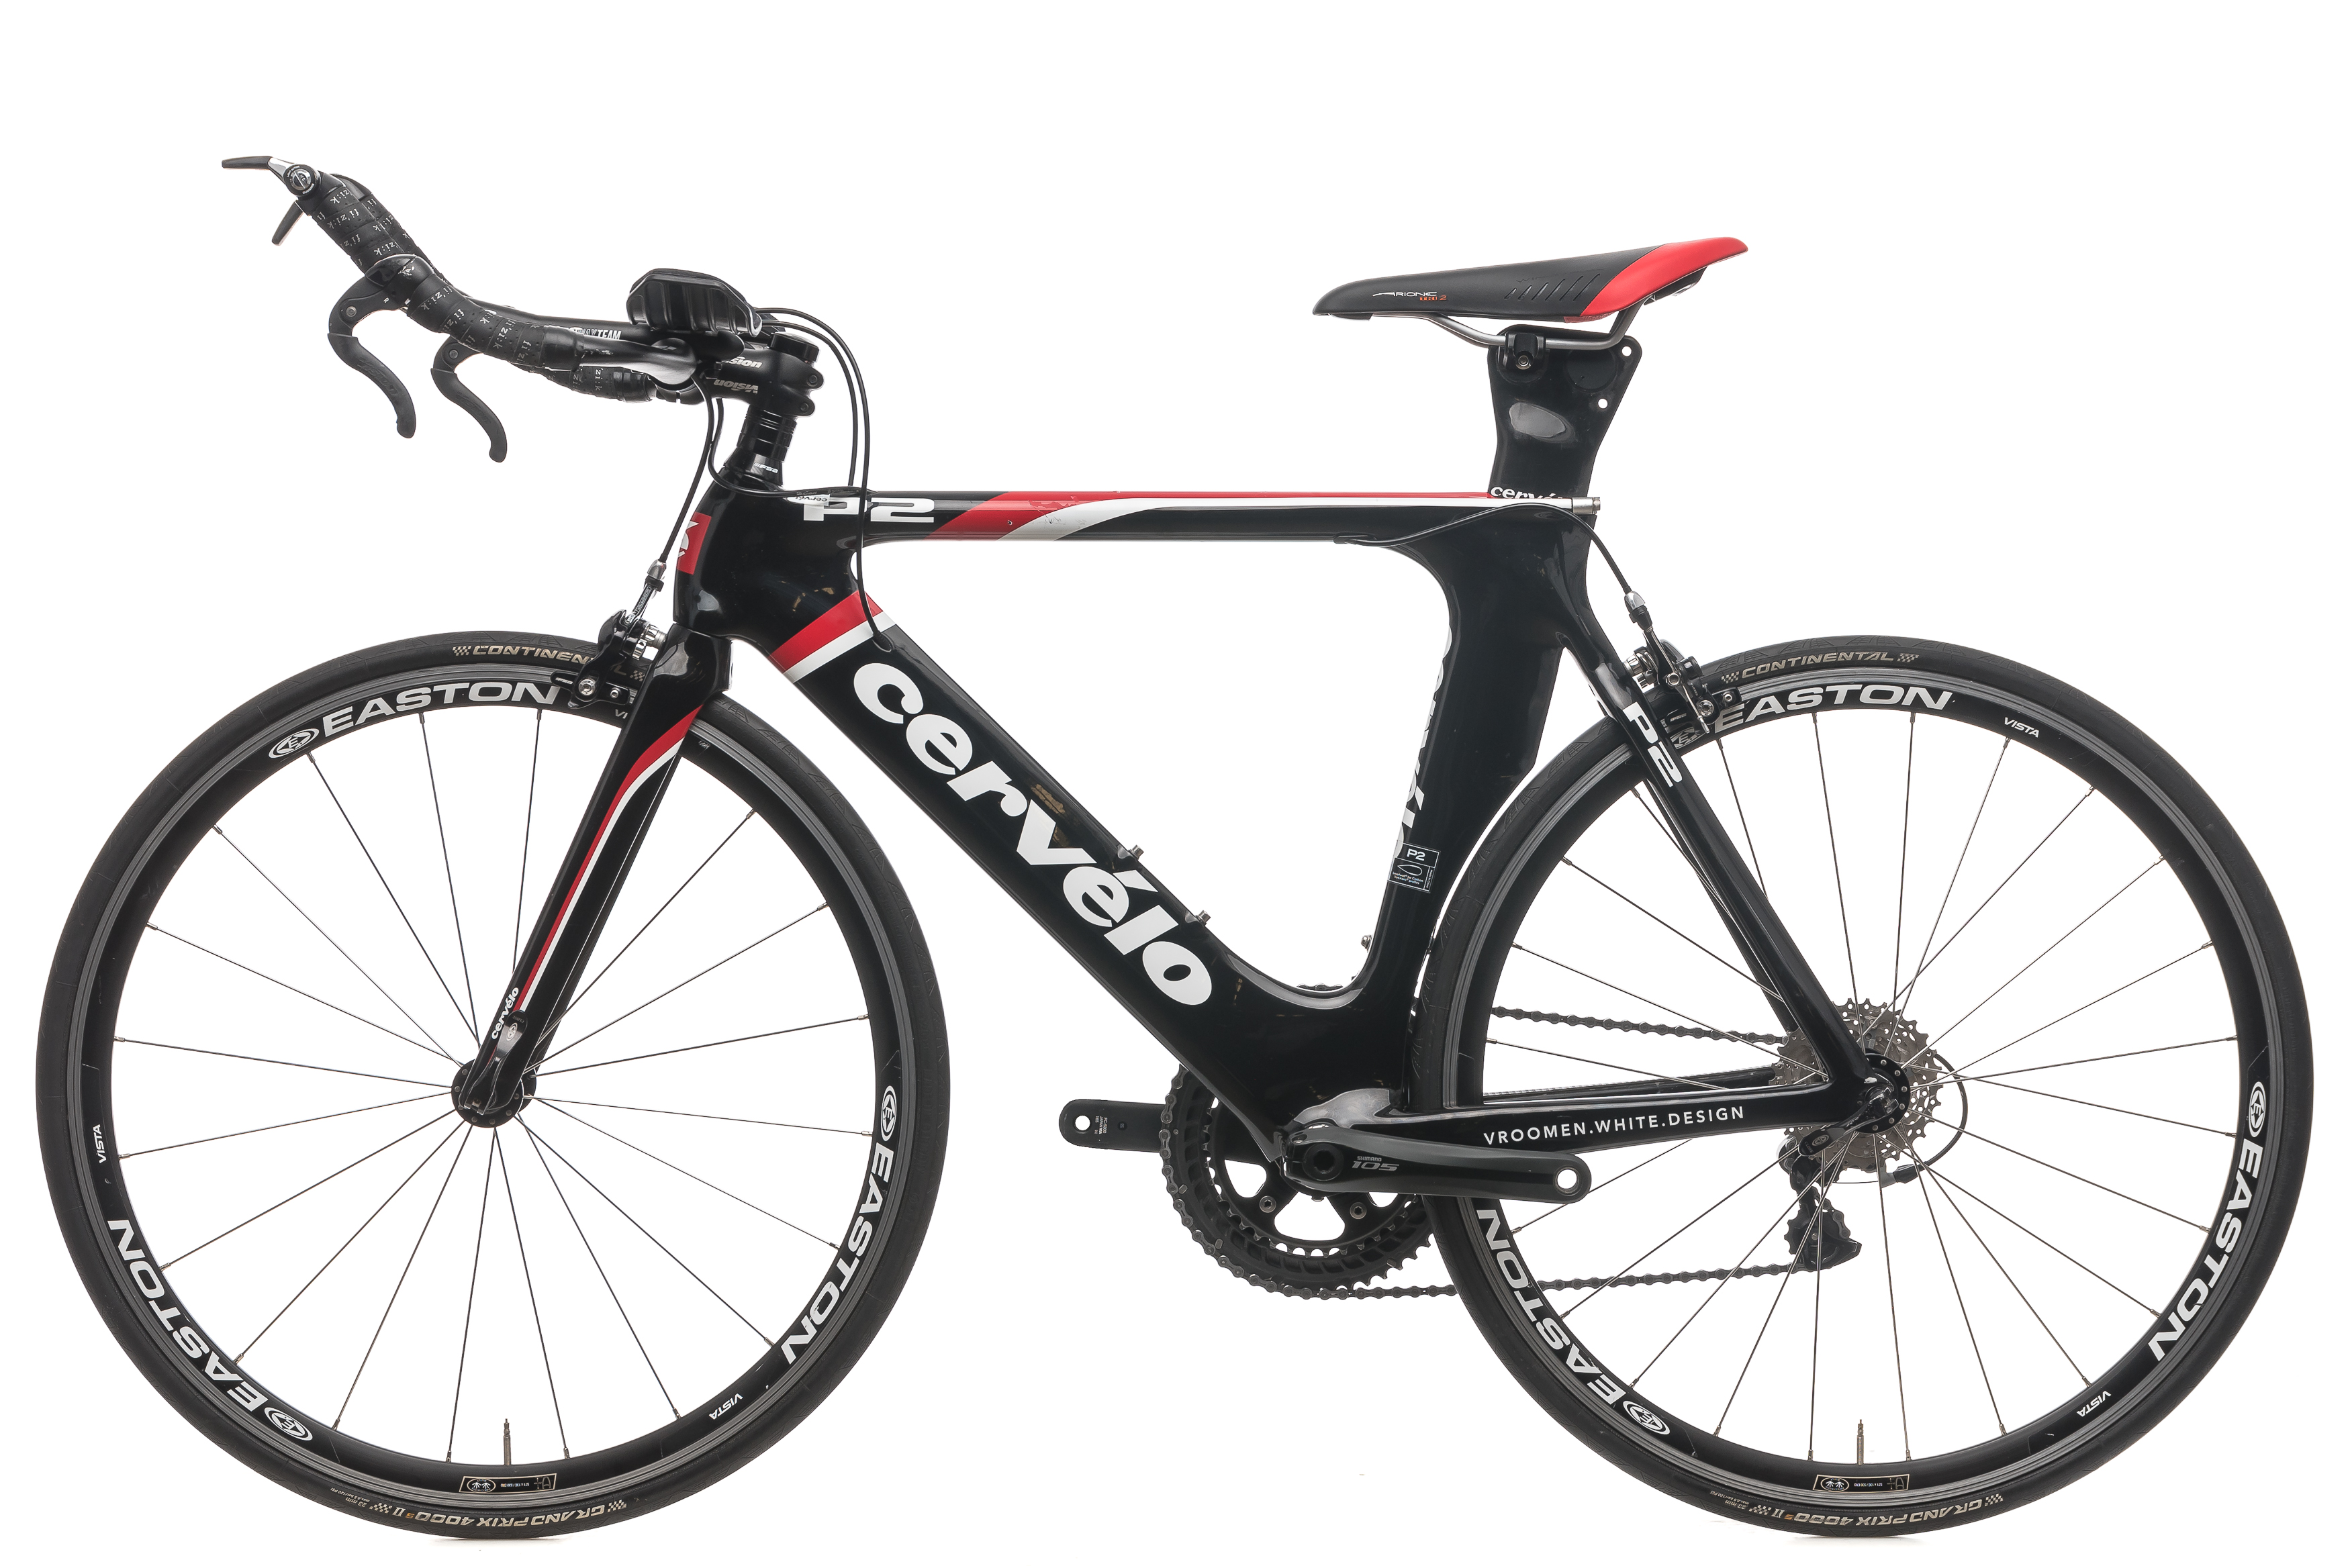 7770f415f26 2012 Cervelo P2 TT Triathlon Bike 48cm 650c Carbon Shimano Ultegra 10s  Easton